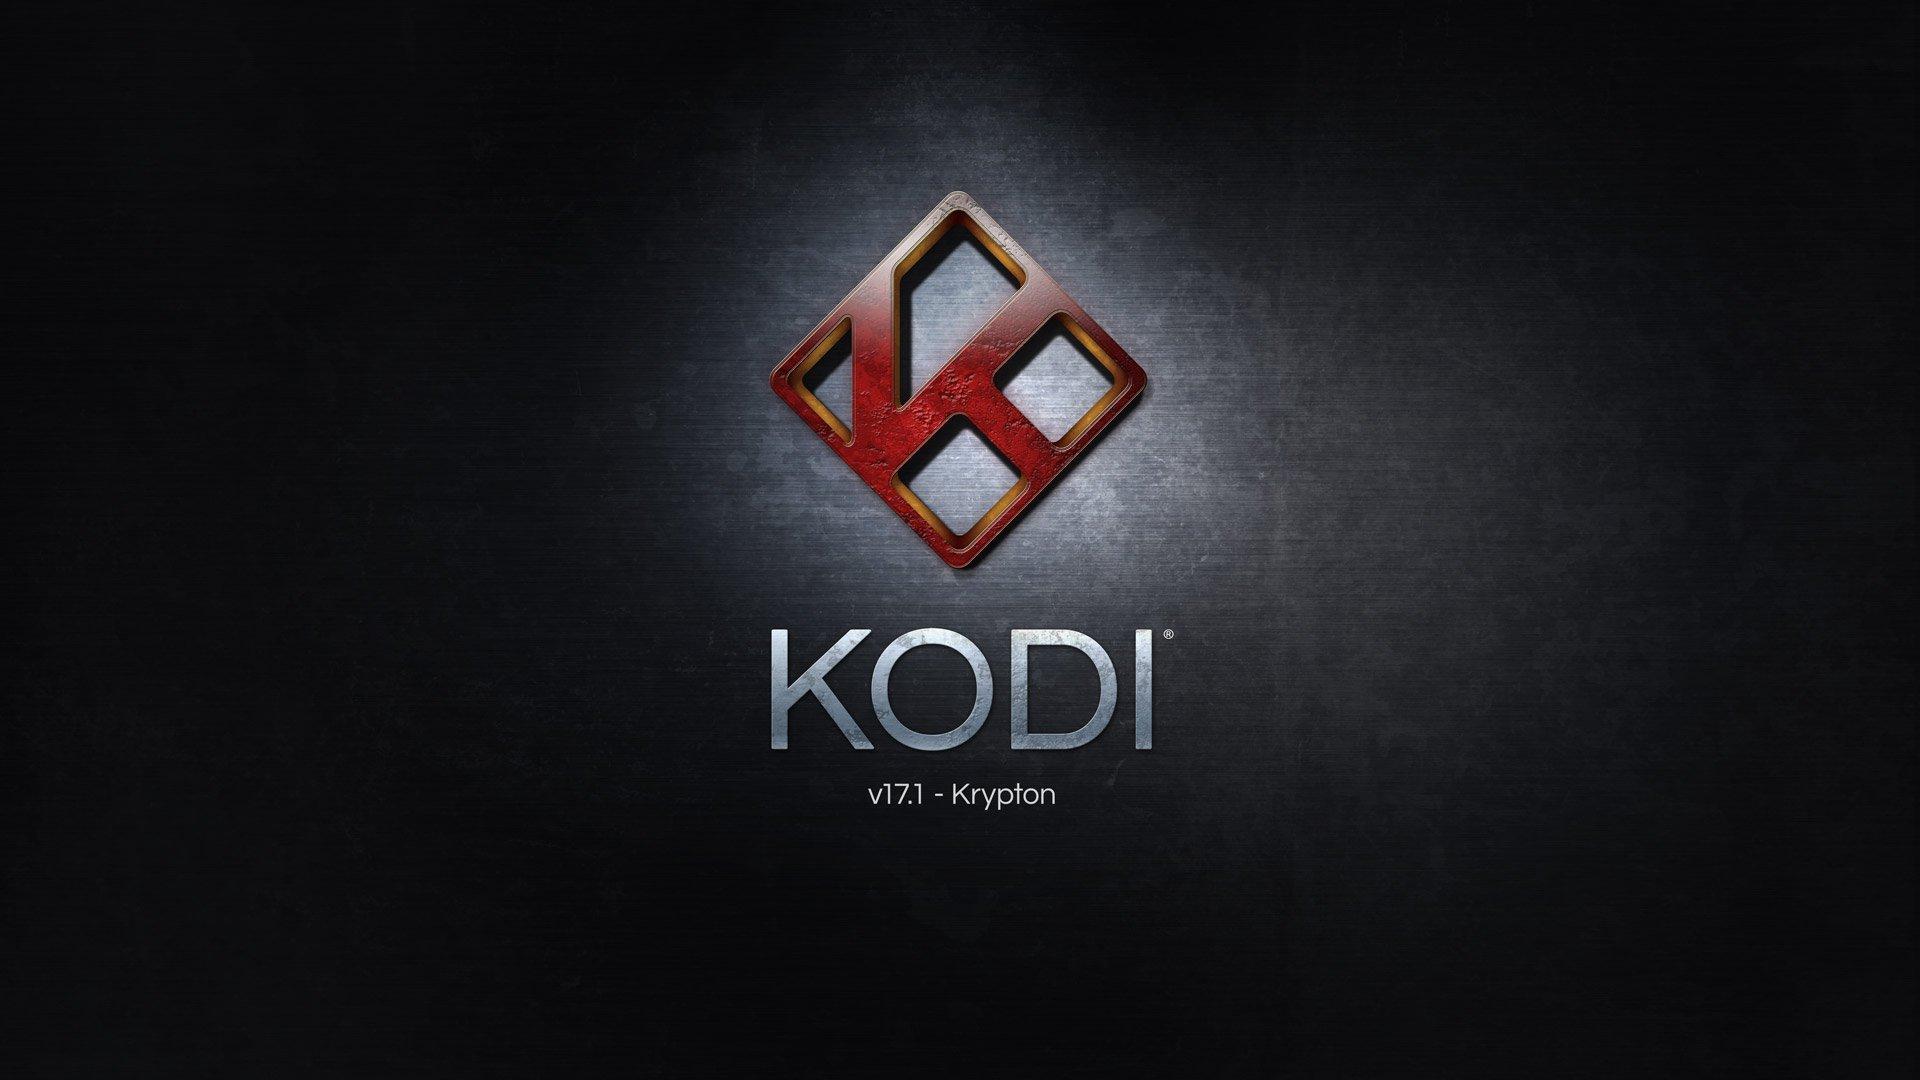 Home Media – Part 4 – OSMC/KODI/XBMC   Nerd Drivel